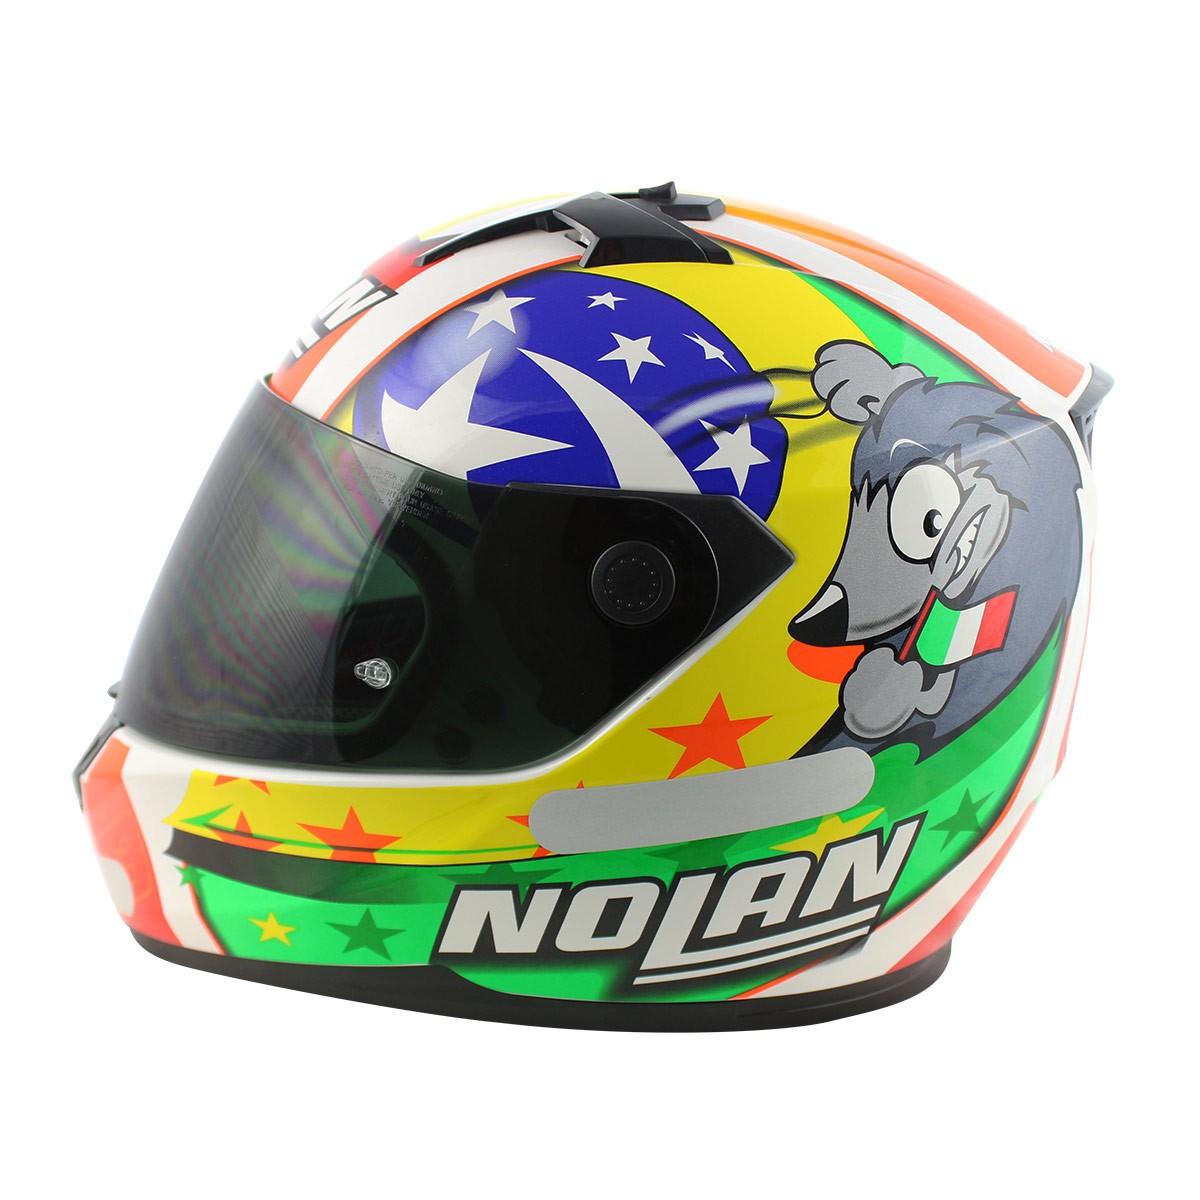 Capacete Nolan N64 Réplica Melandri Misano Cor: 65 - Ganhe Balaclava - Mês do Motociclista